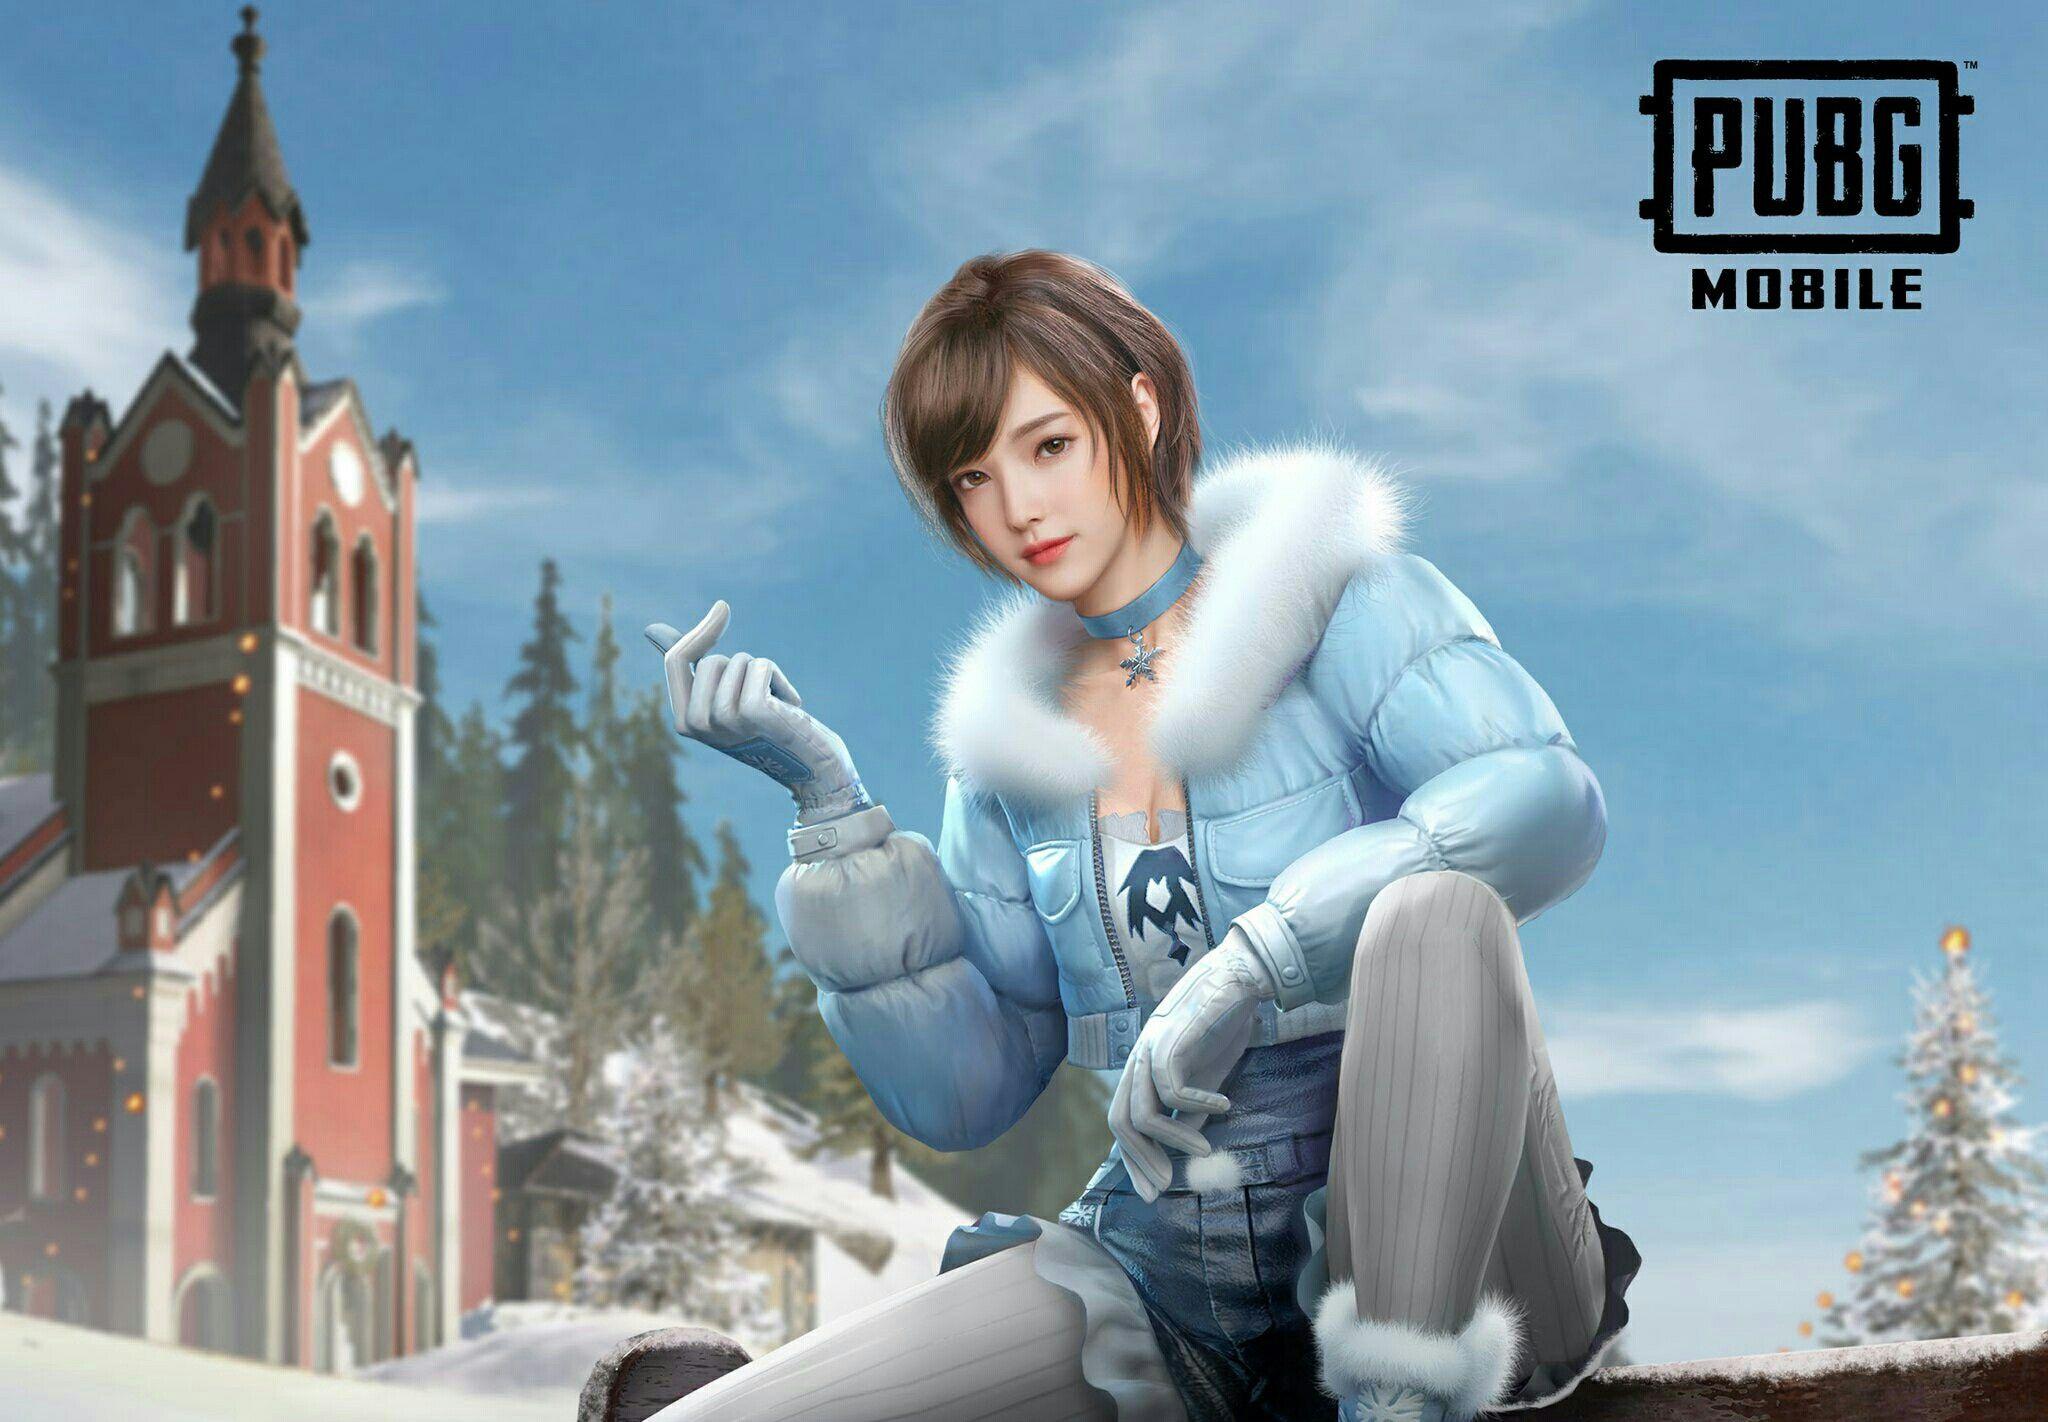 Winter Lady Set Image Wallpaper Wallpaper Free Download